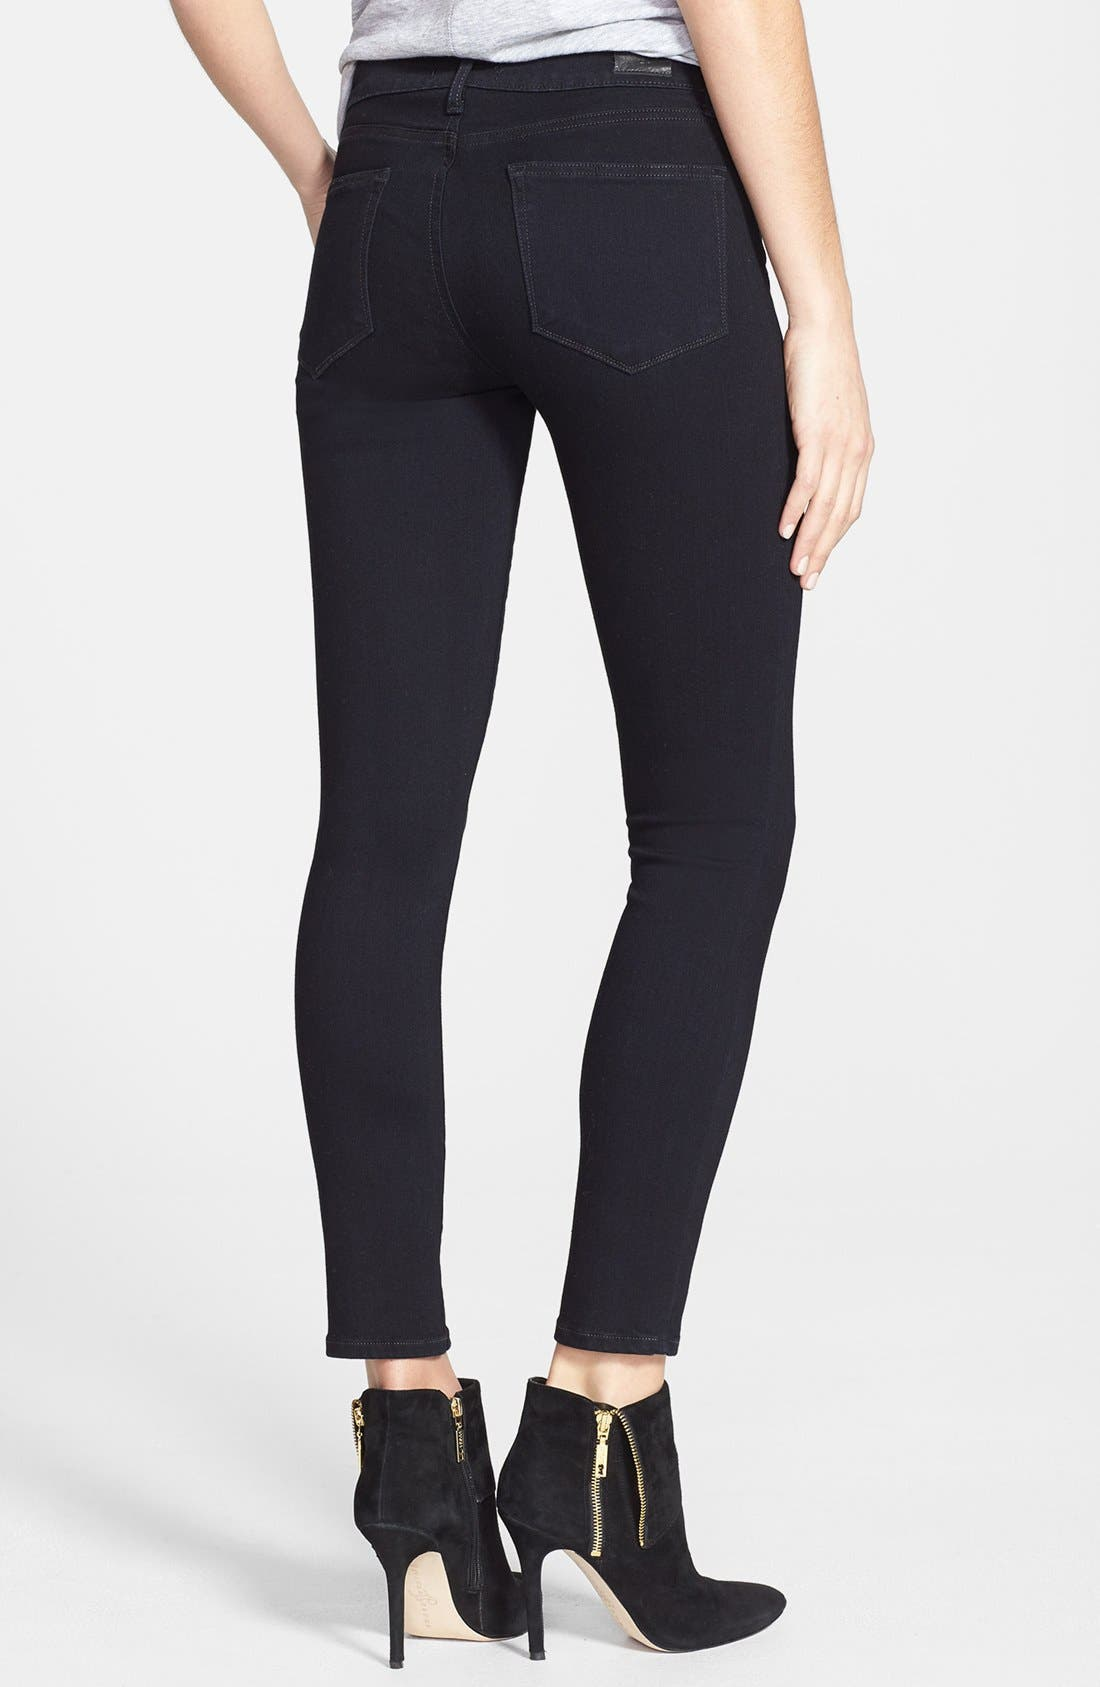 Alternate Image 2  - Paige Denim 'Verdugo' Skinny Ankle Jeans (Kensington)